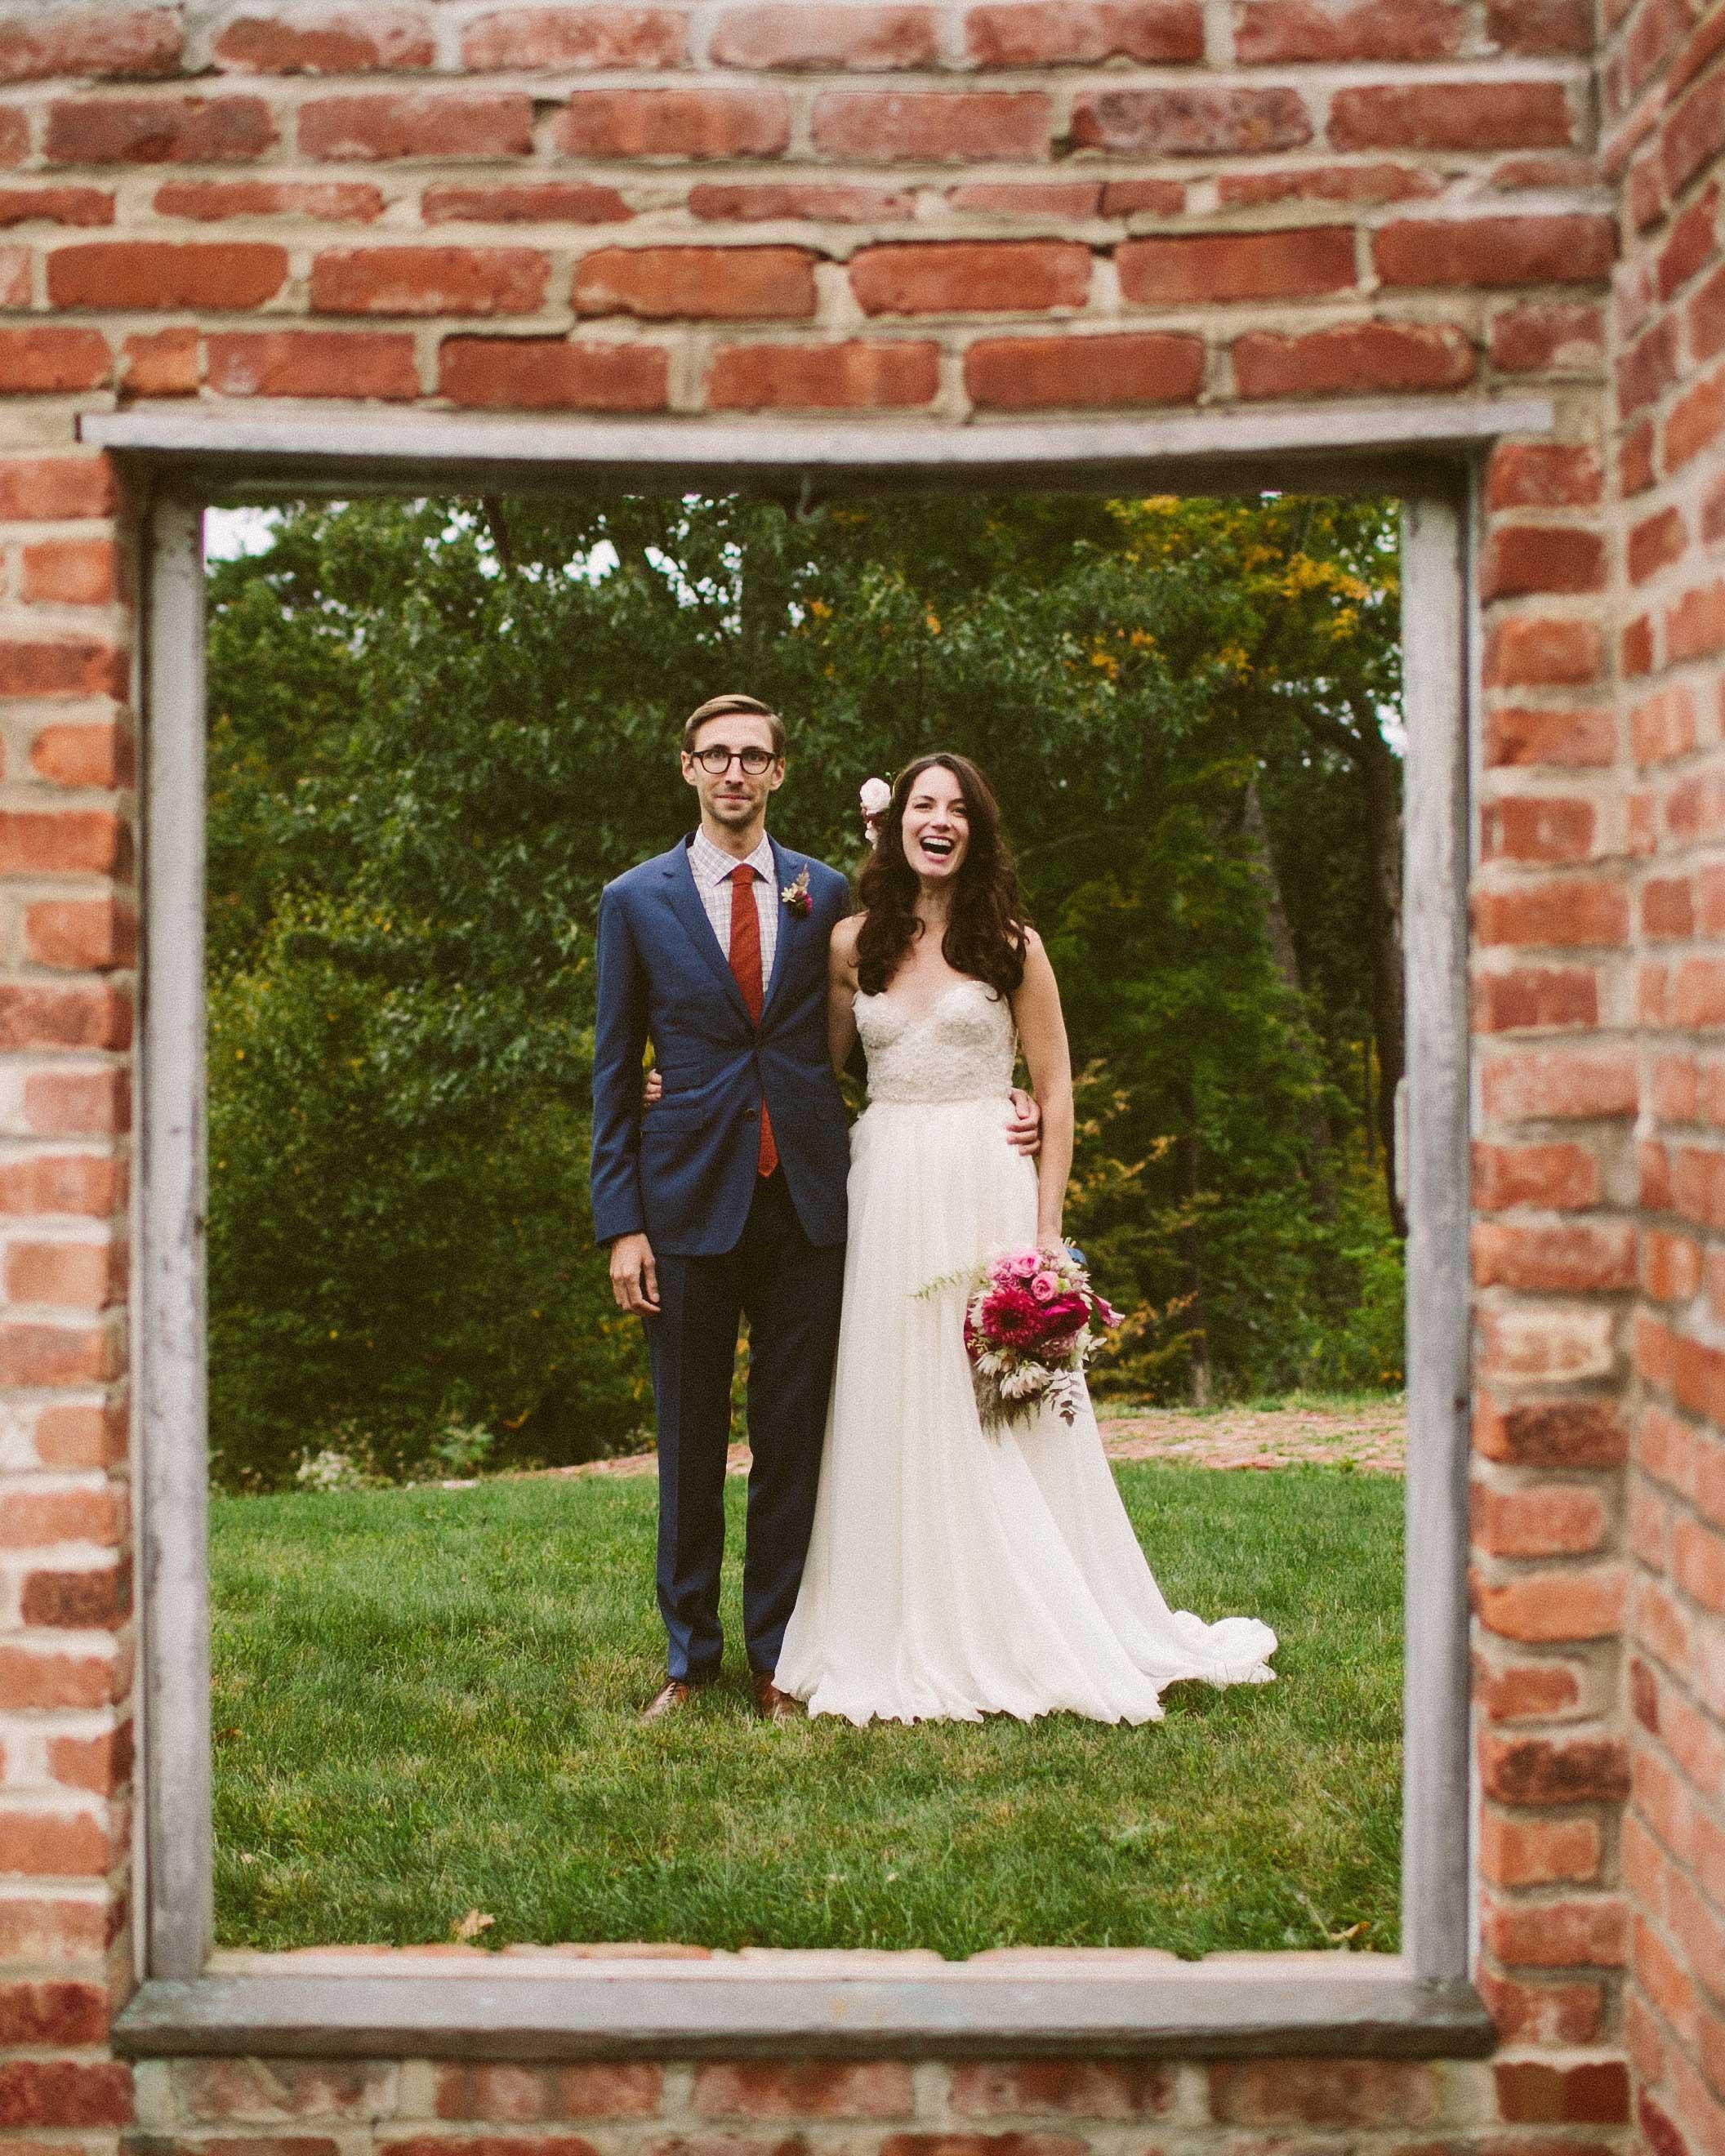 alisa-barrett-wedding-couple-233-s113048-0716.jpg